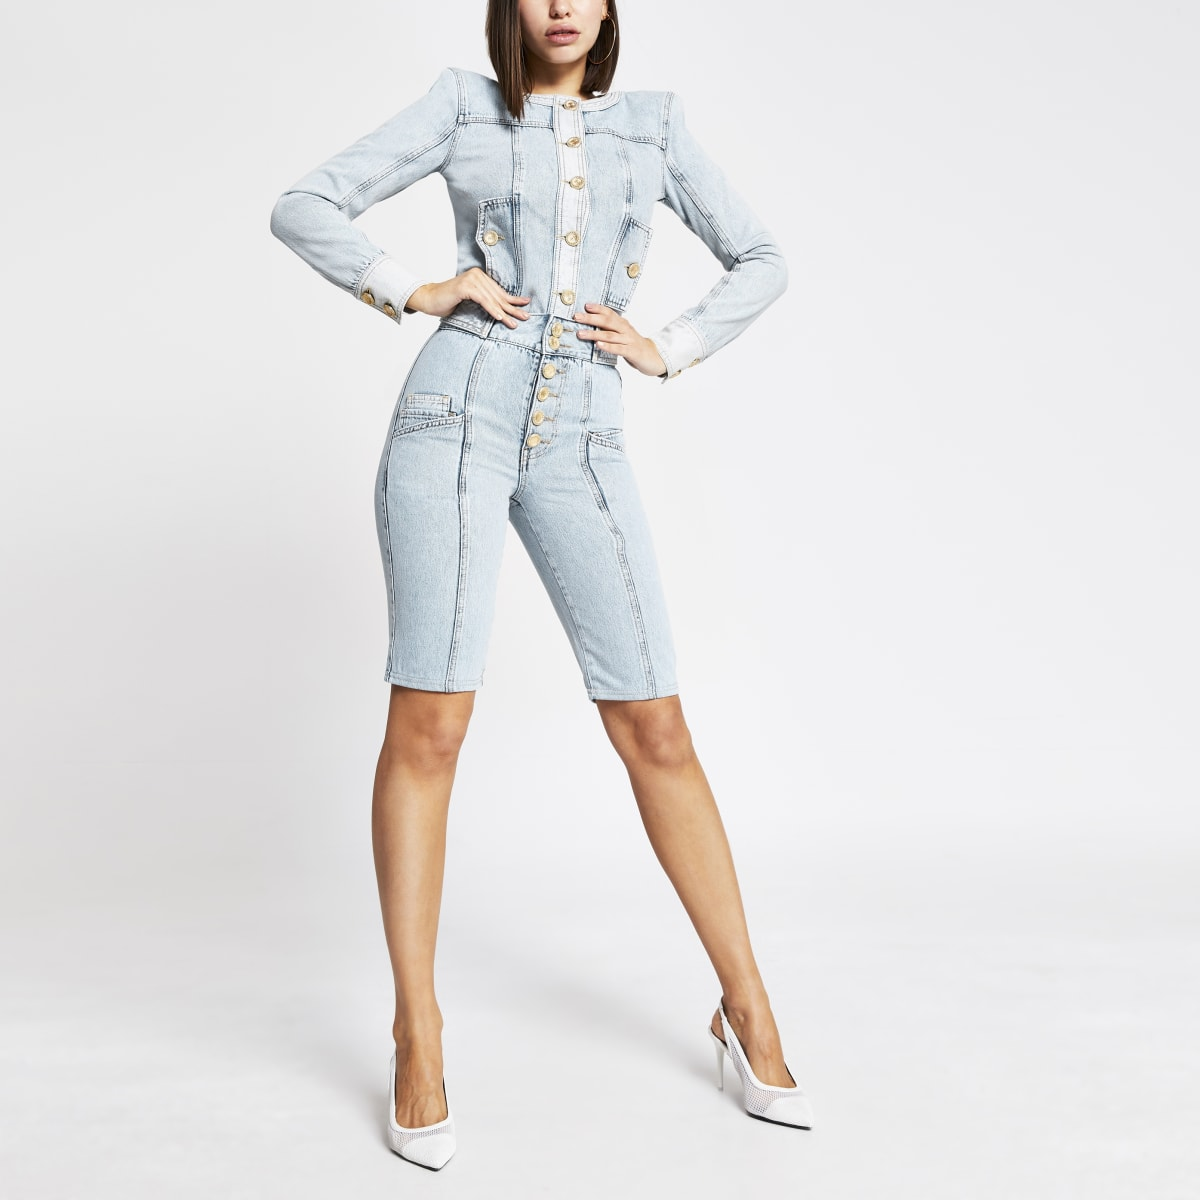 Blue high rise button front denim shorts